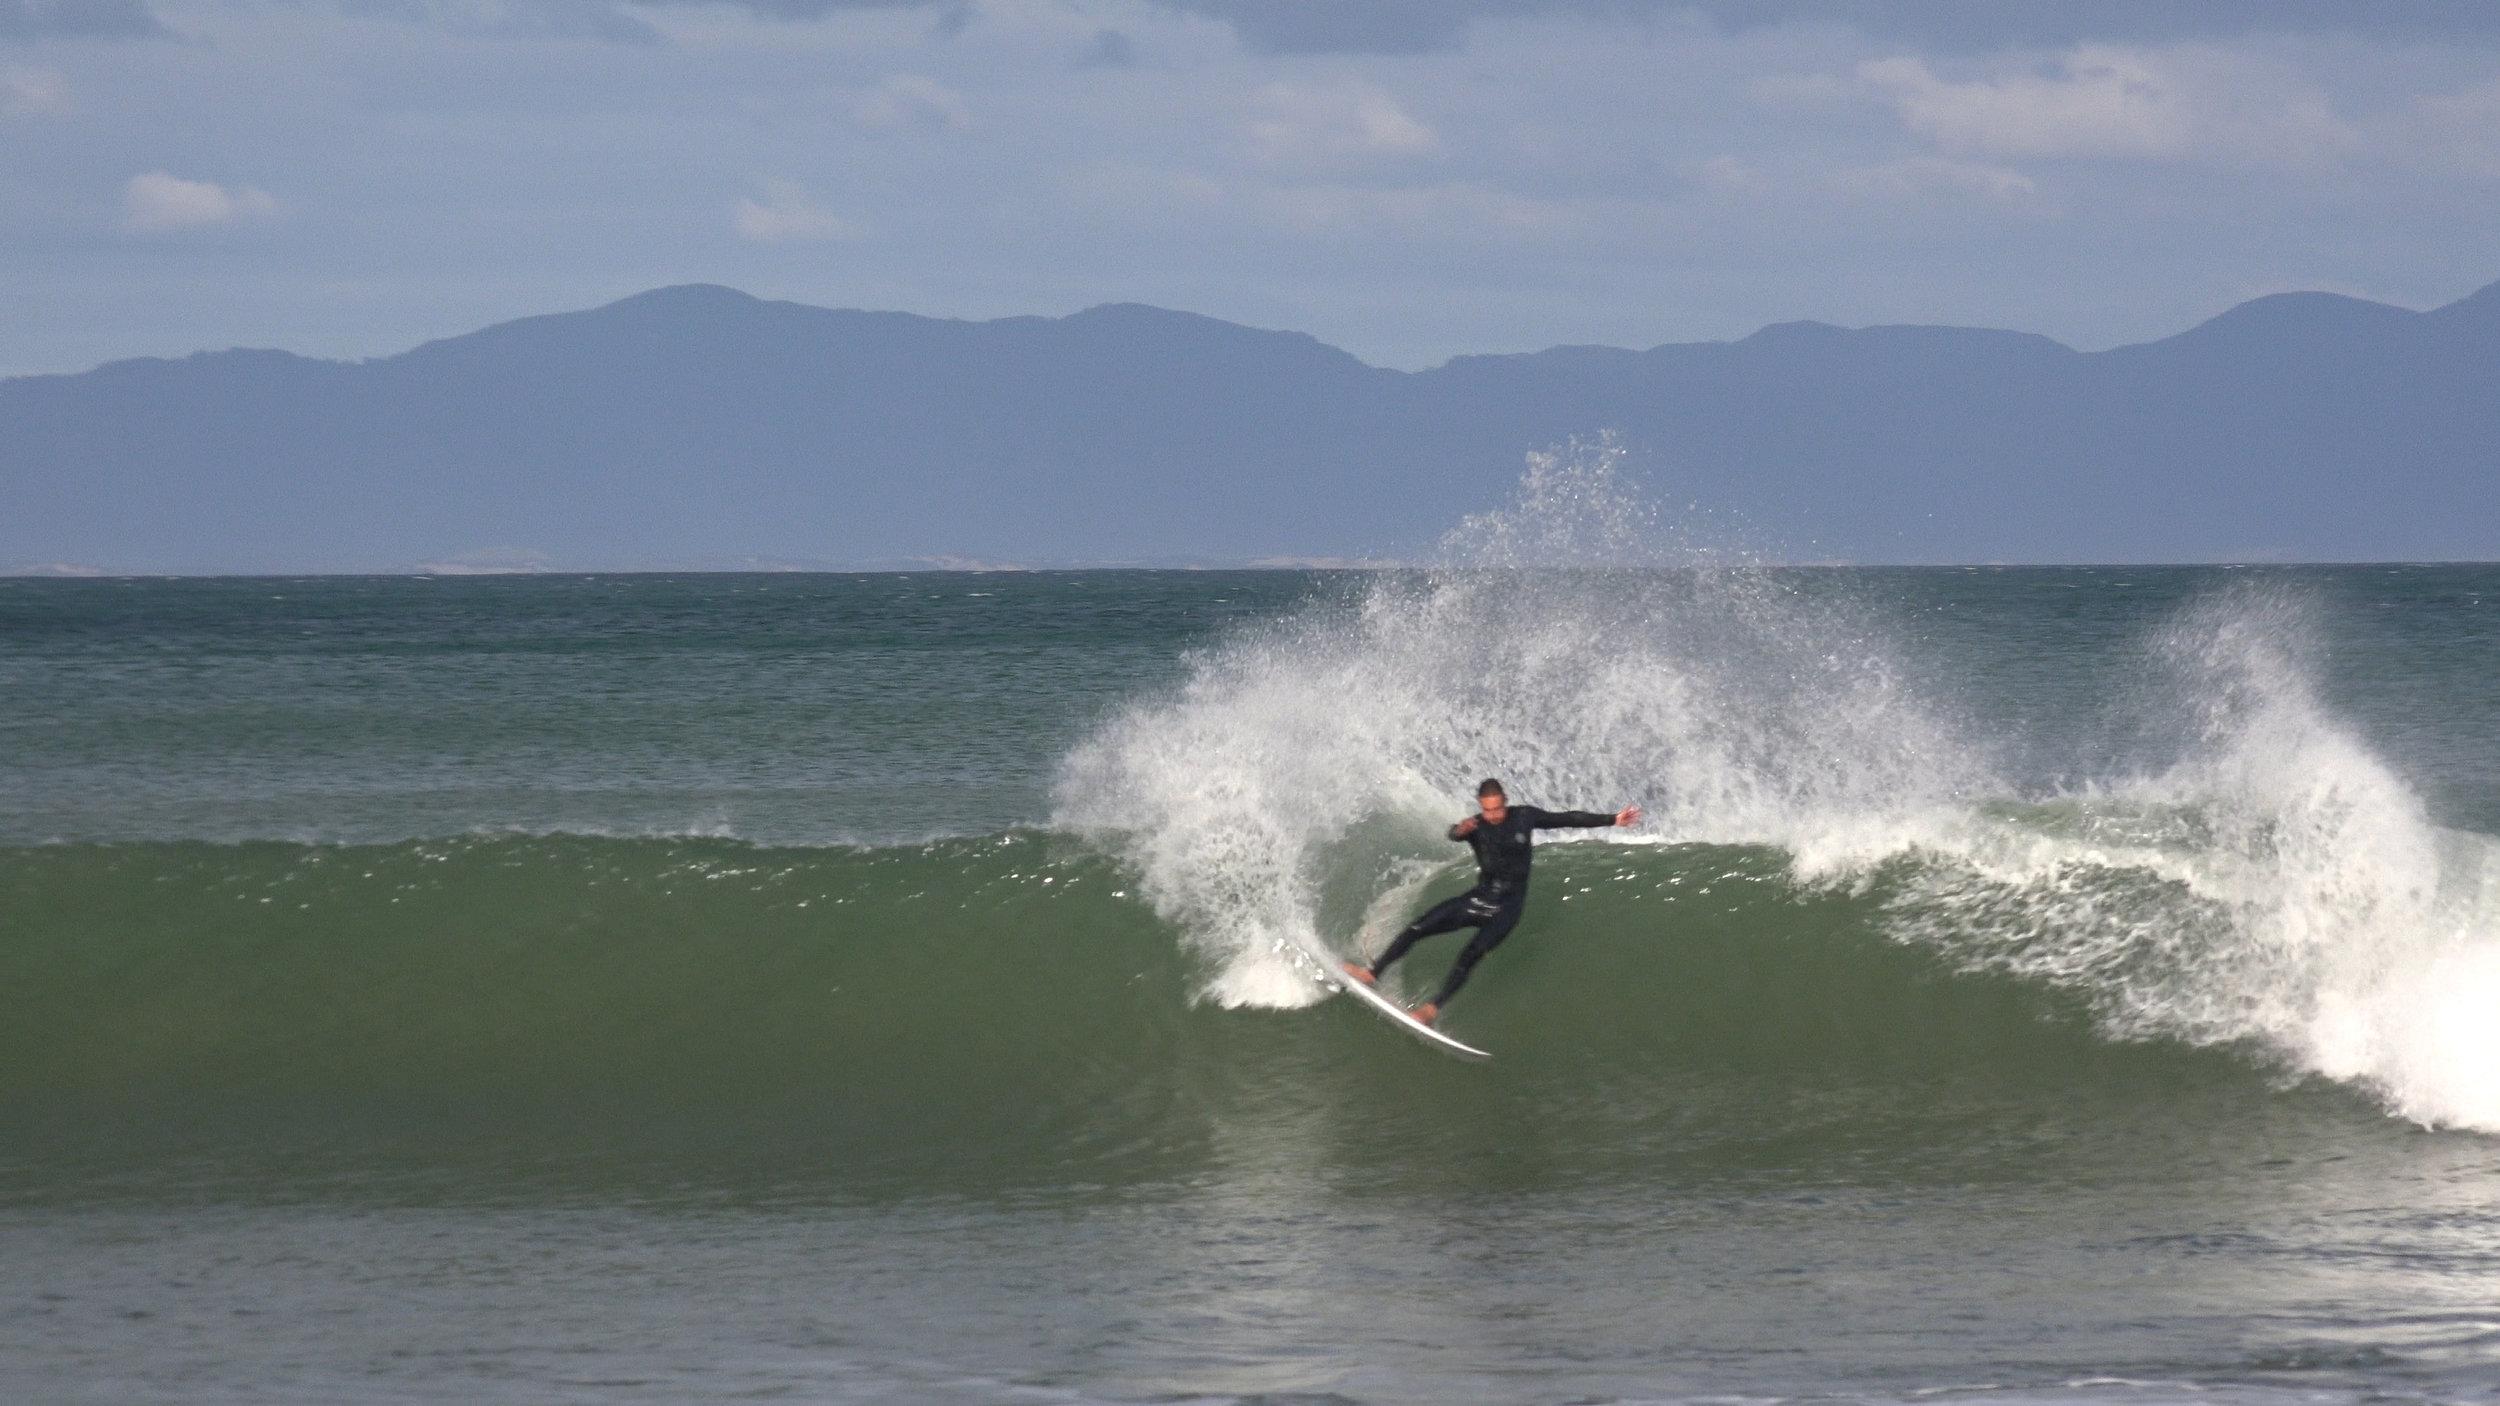 Archysurf Phillip Island Surf coaching